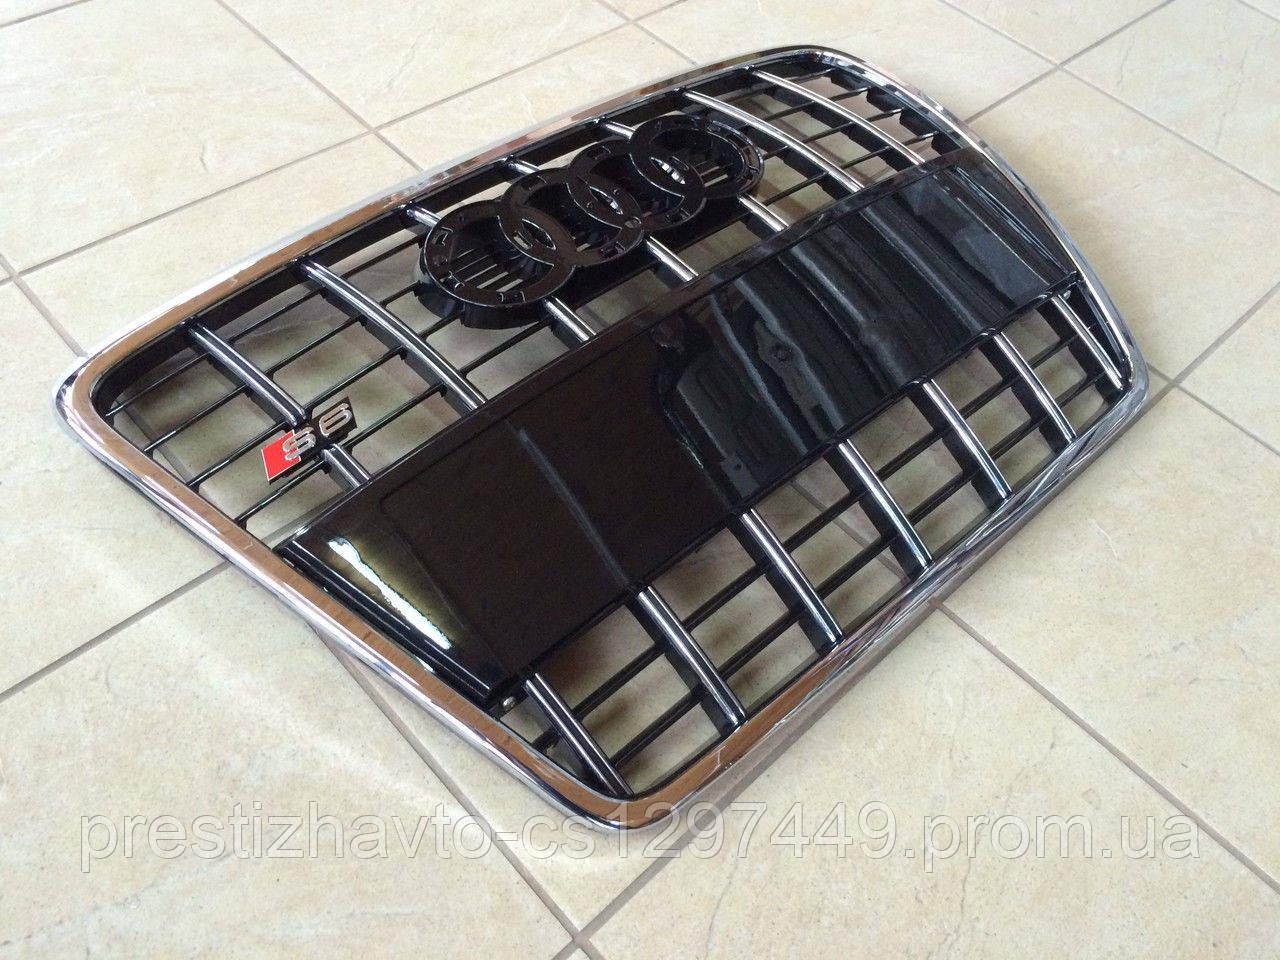 Решетка радиатора на Audi A6 S6 (2008-2012)